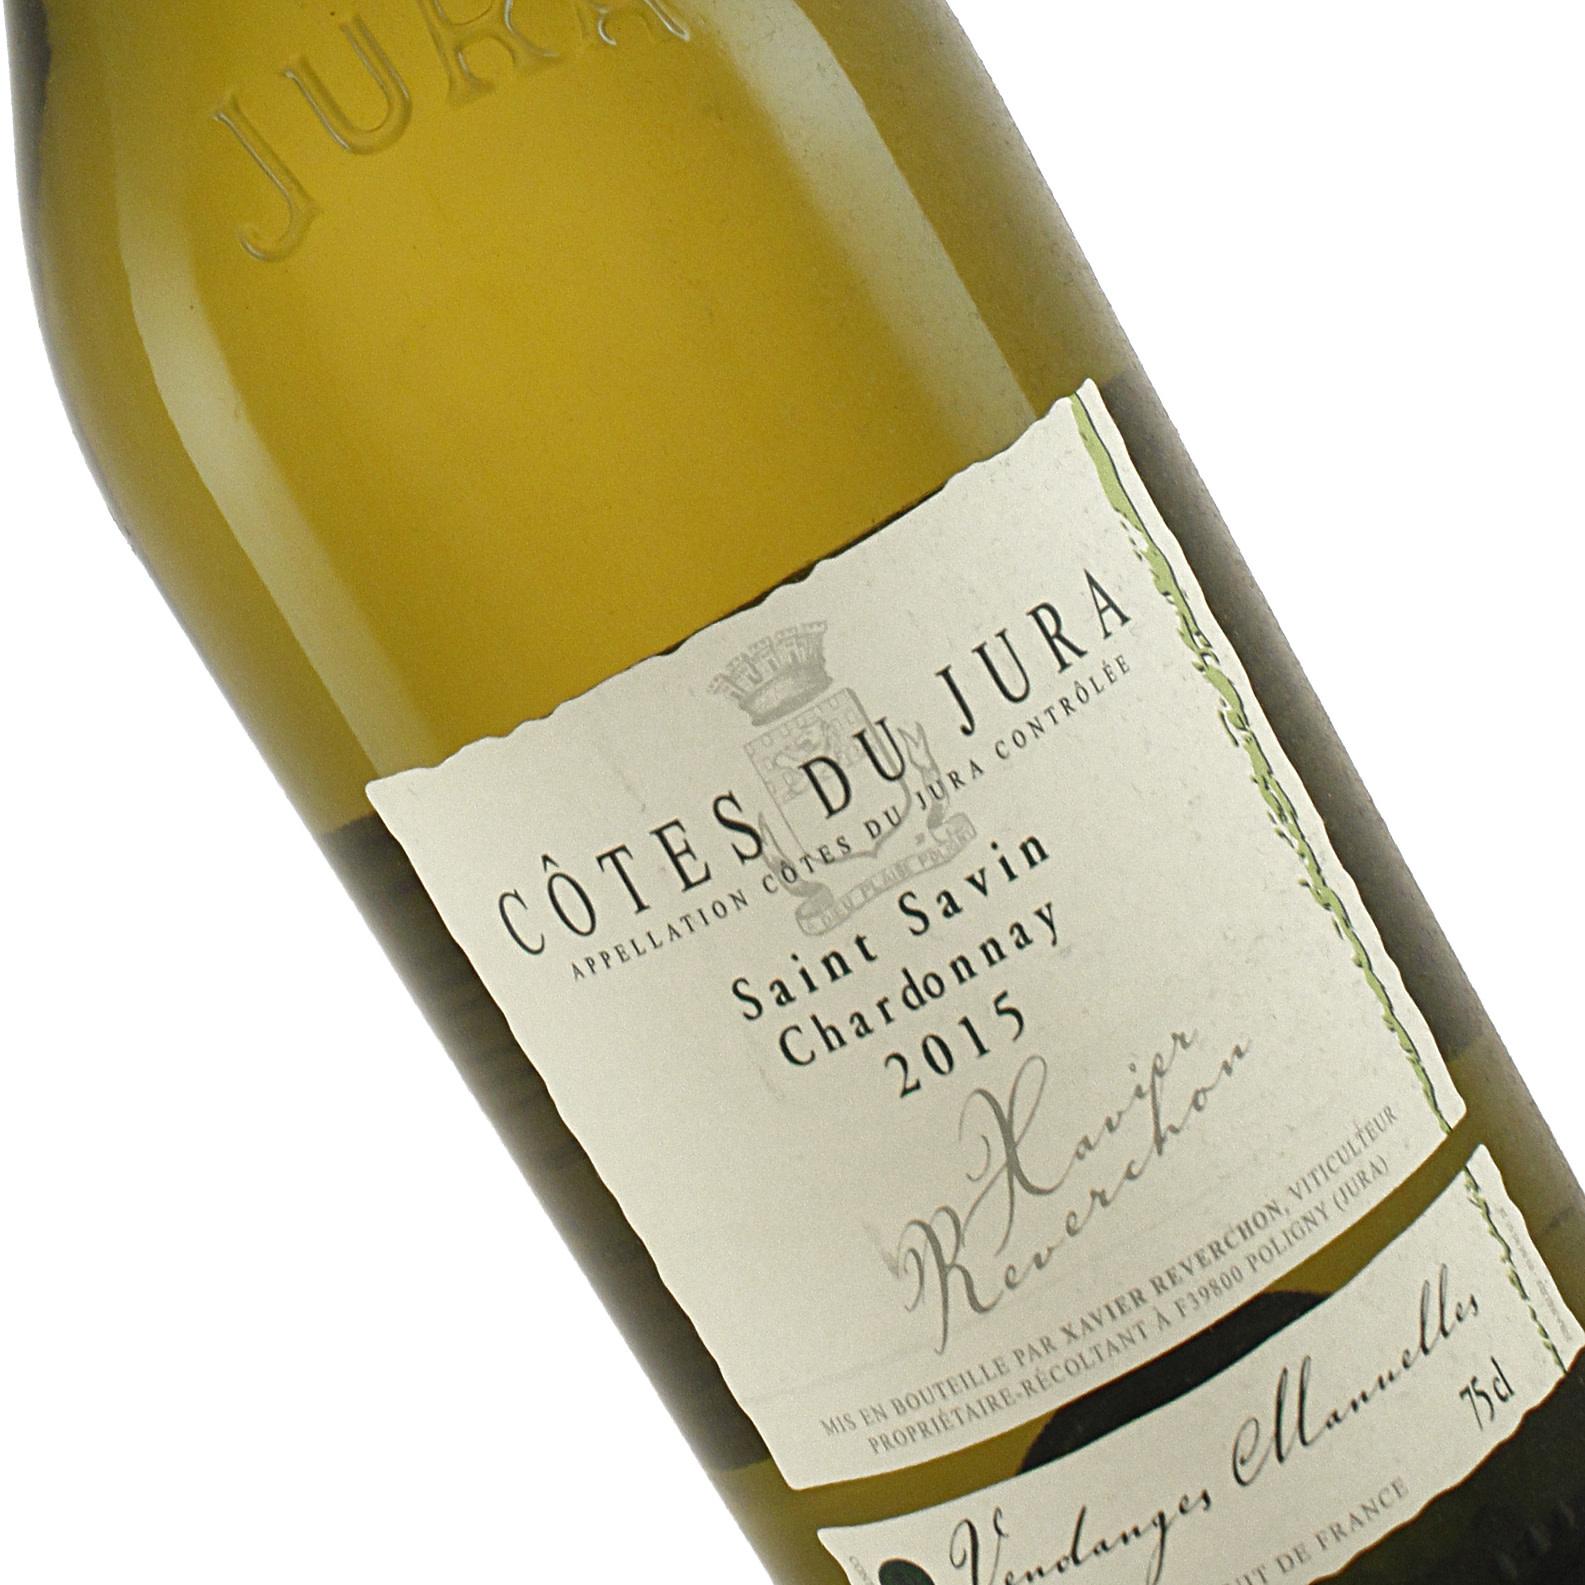 Xavier Reverchon 2015 Chardonnay Saint Savin Cotes Du Jura